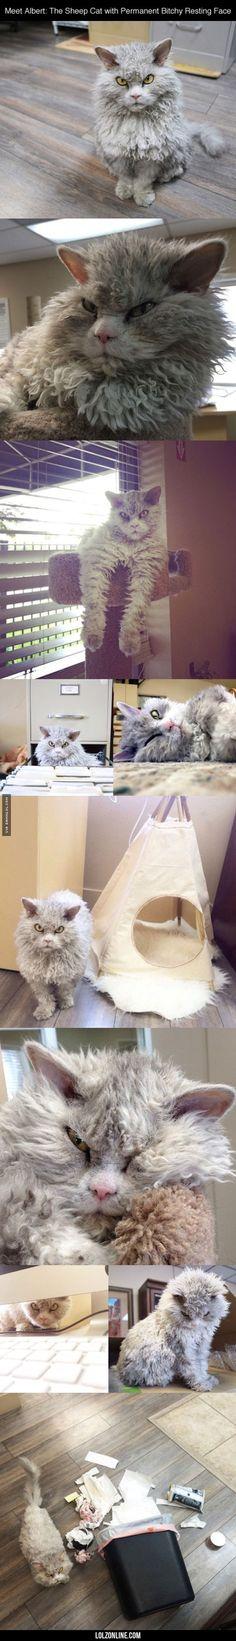 Sheep Cat #lol #haha #funny